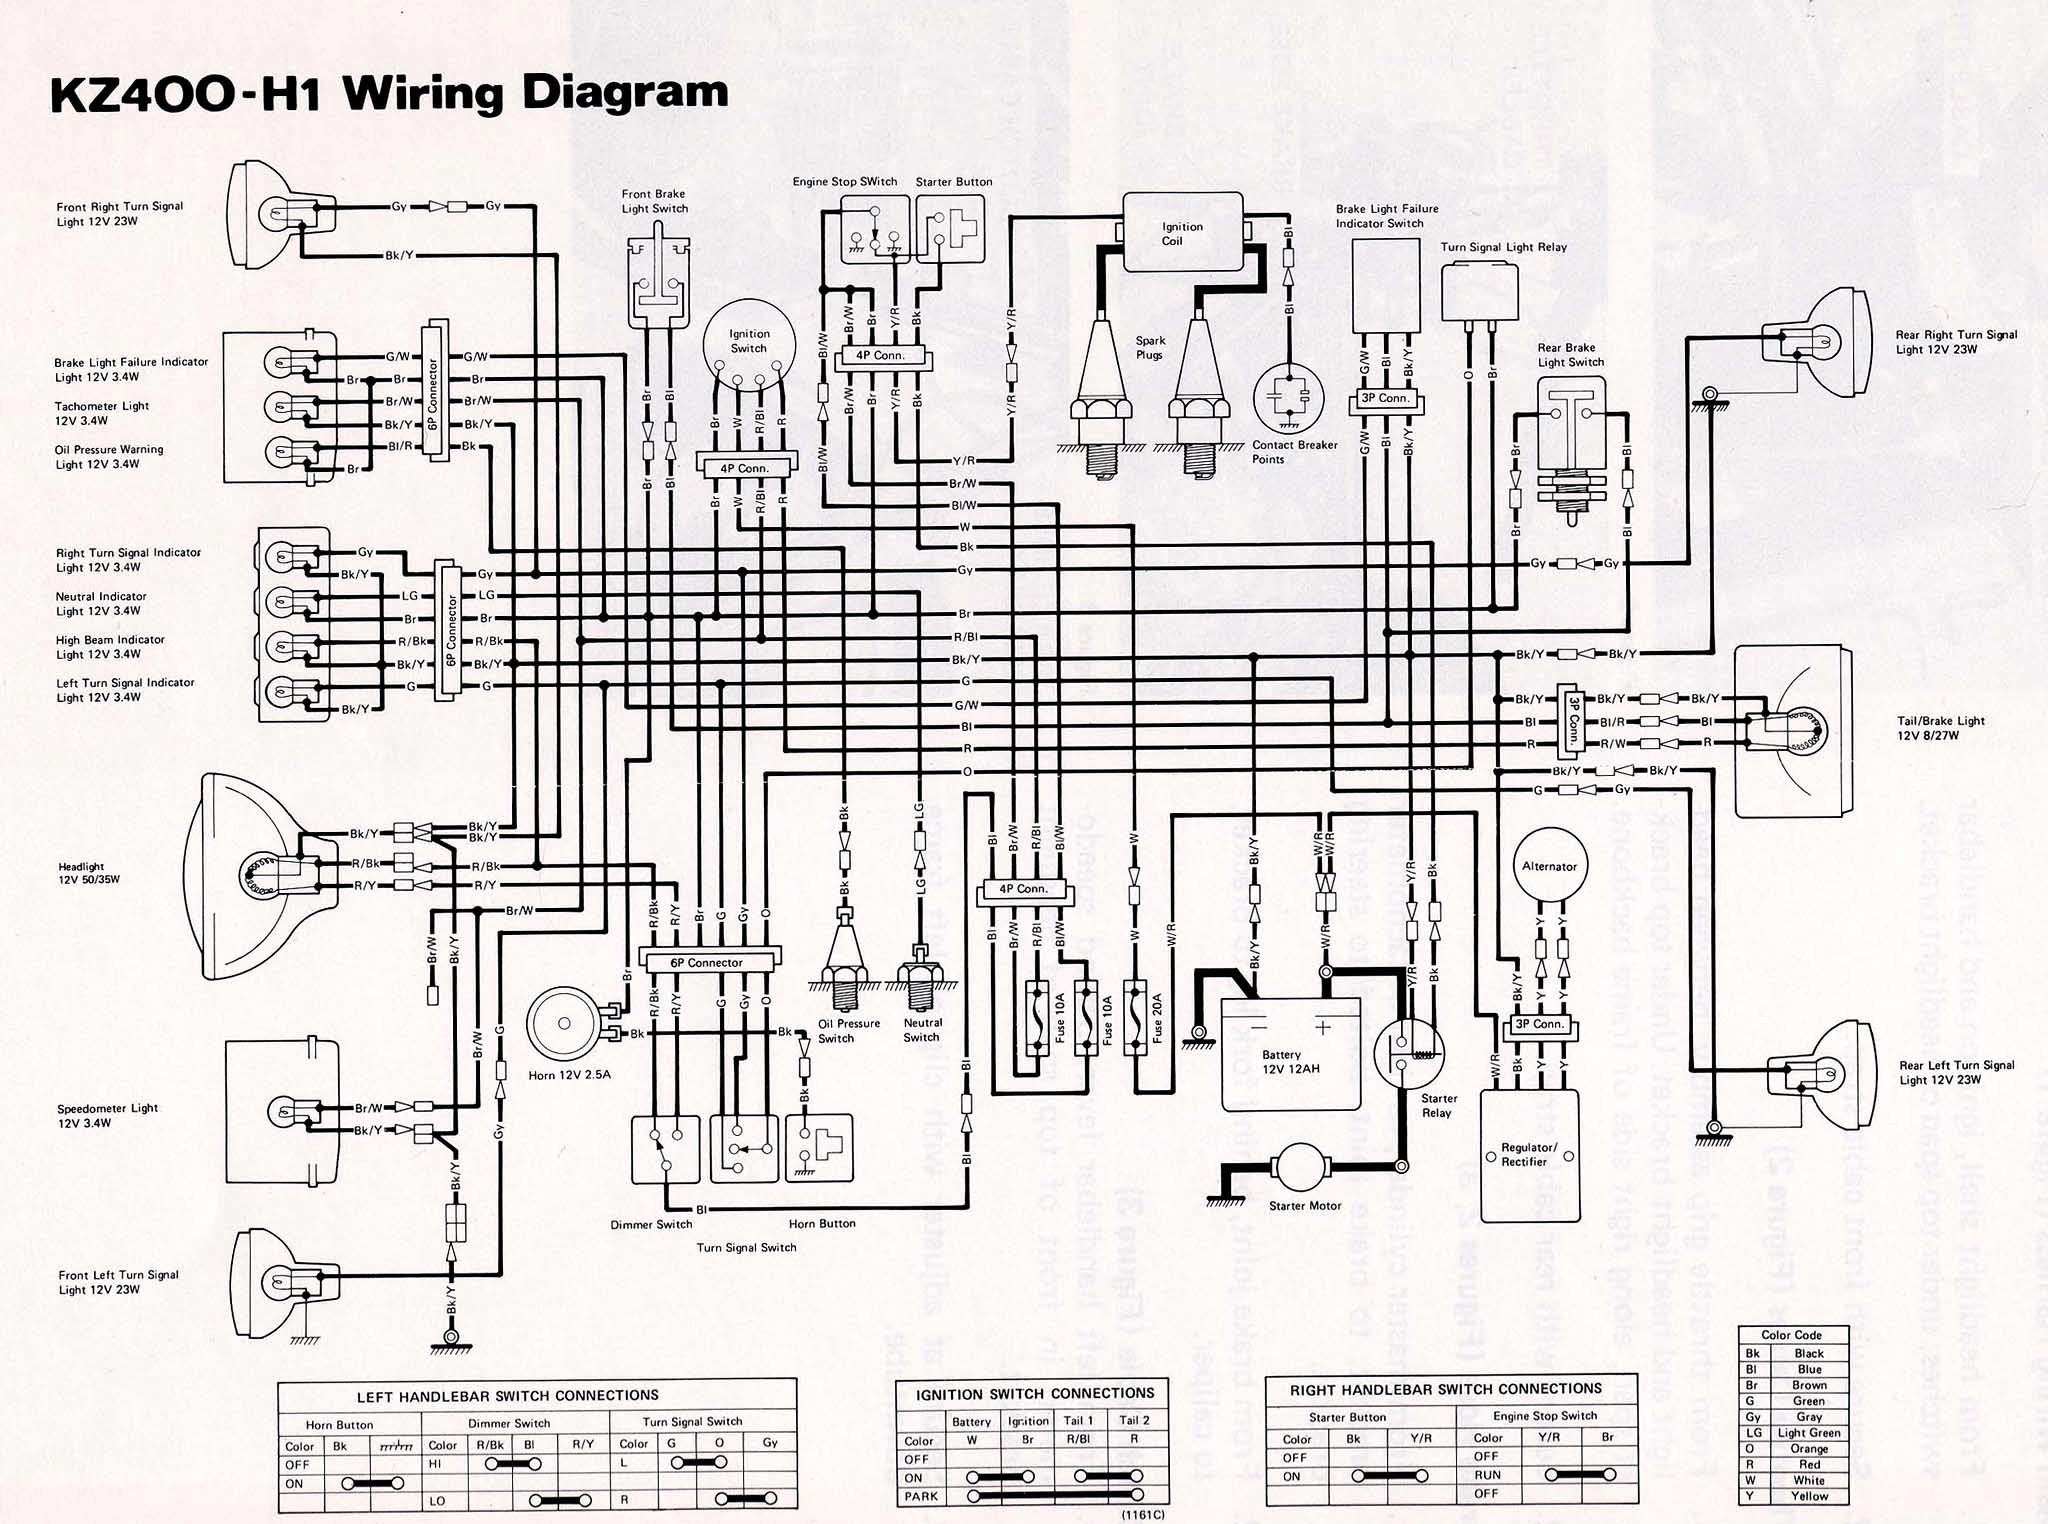 kz400 wiring diagram circuits symbols diagrams u2022 rh amdrums co uk